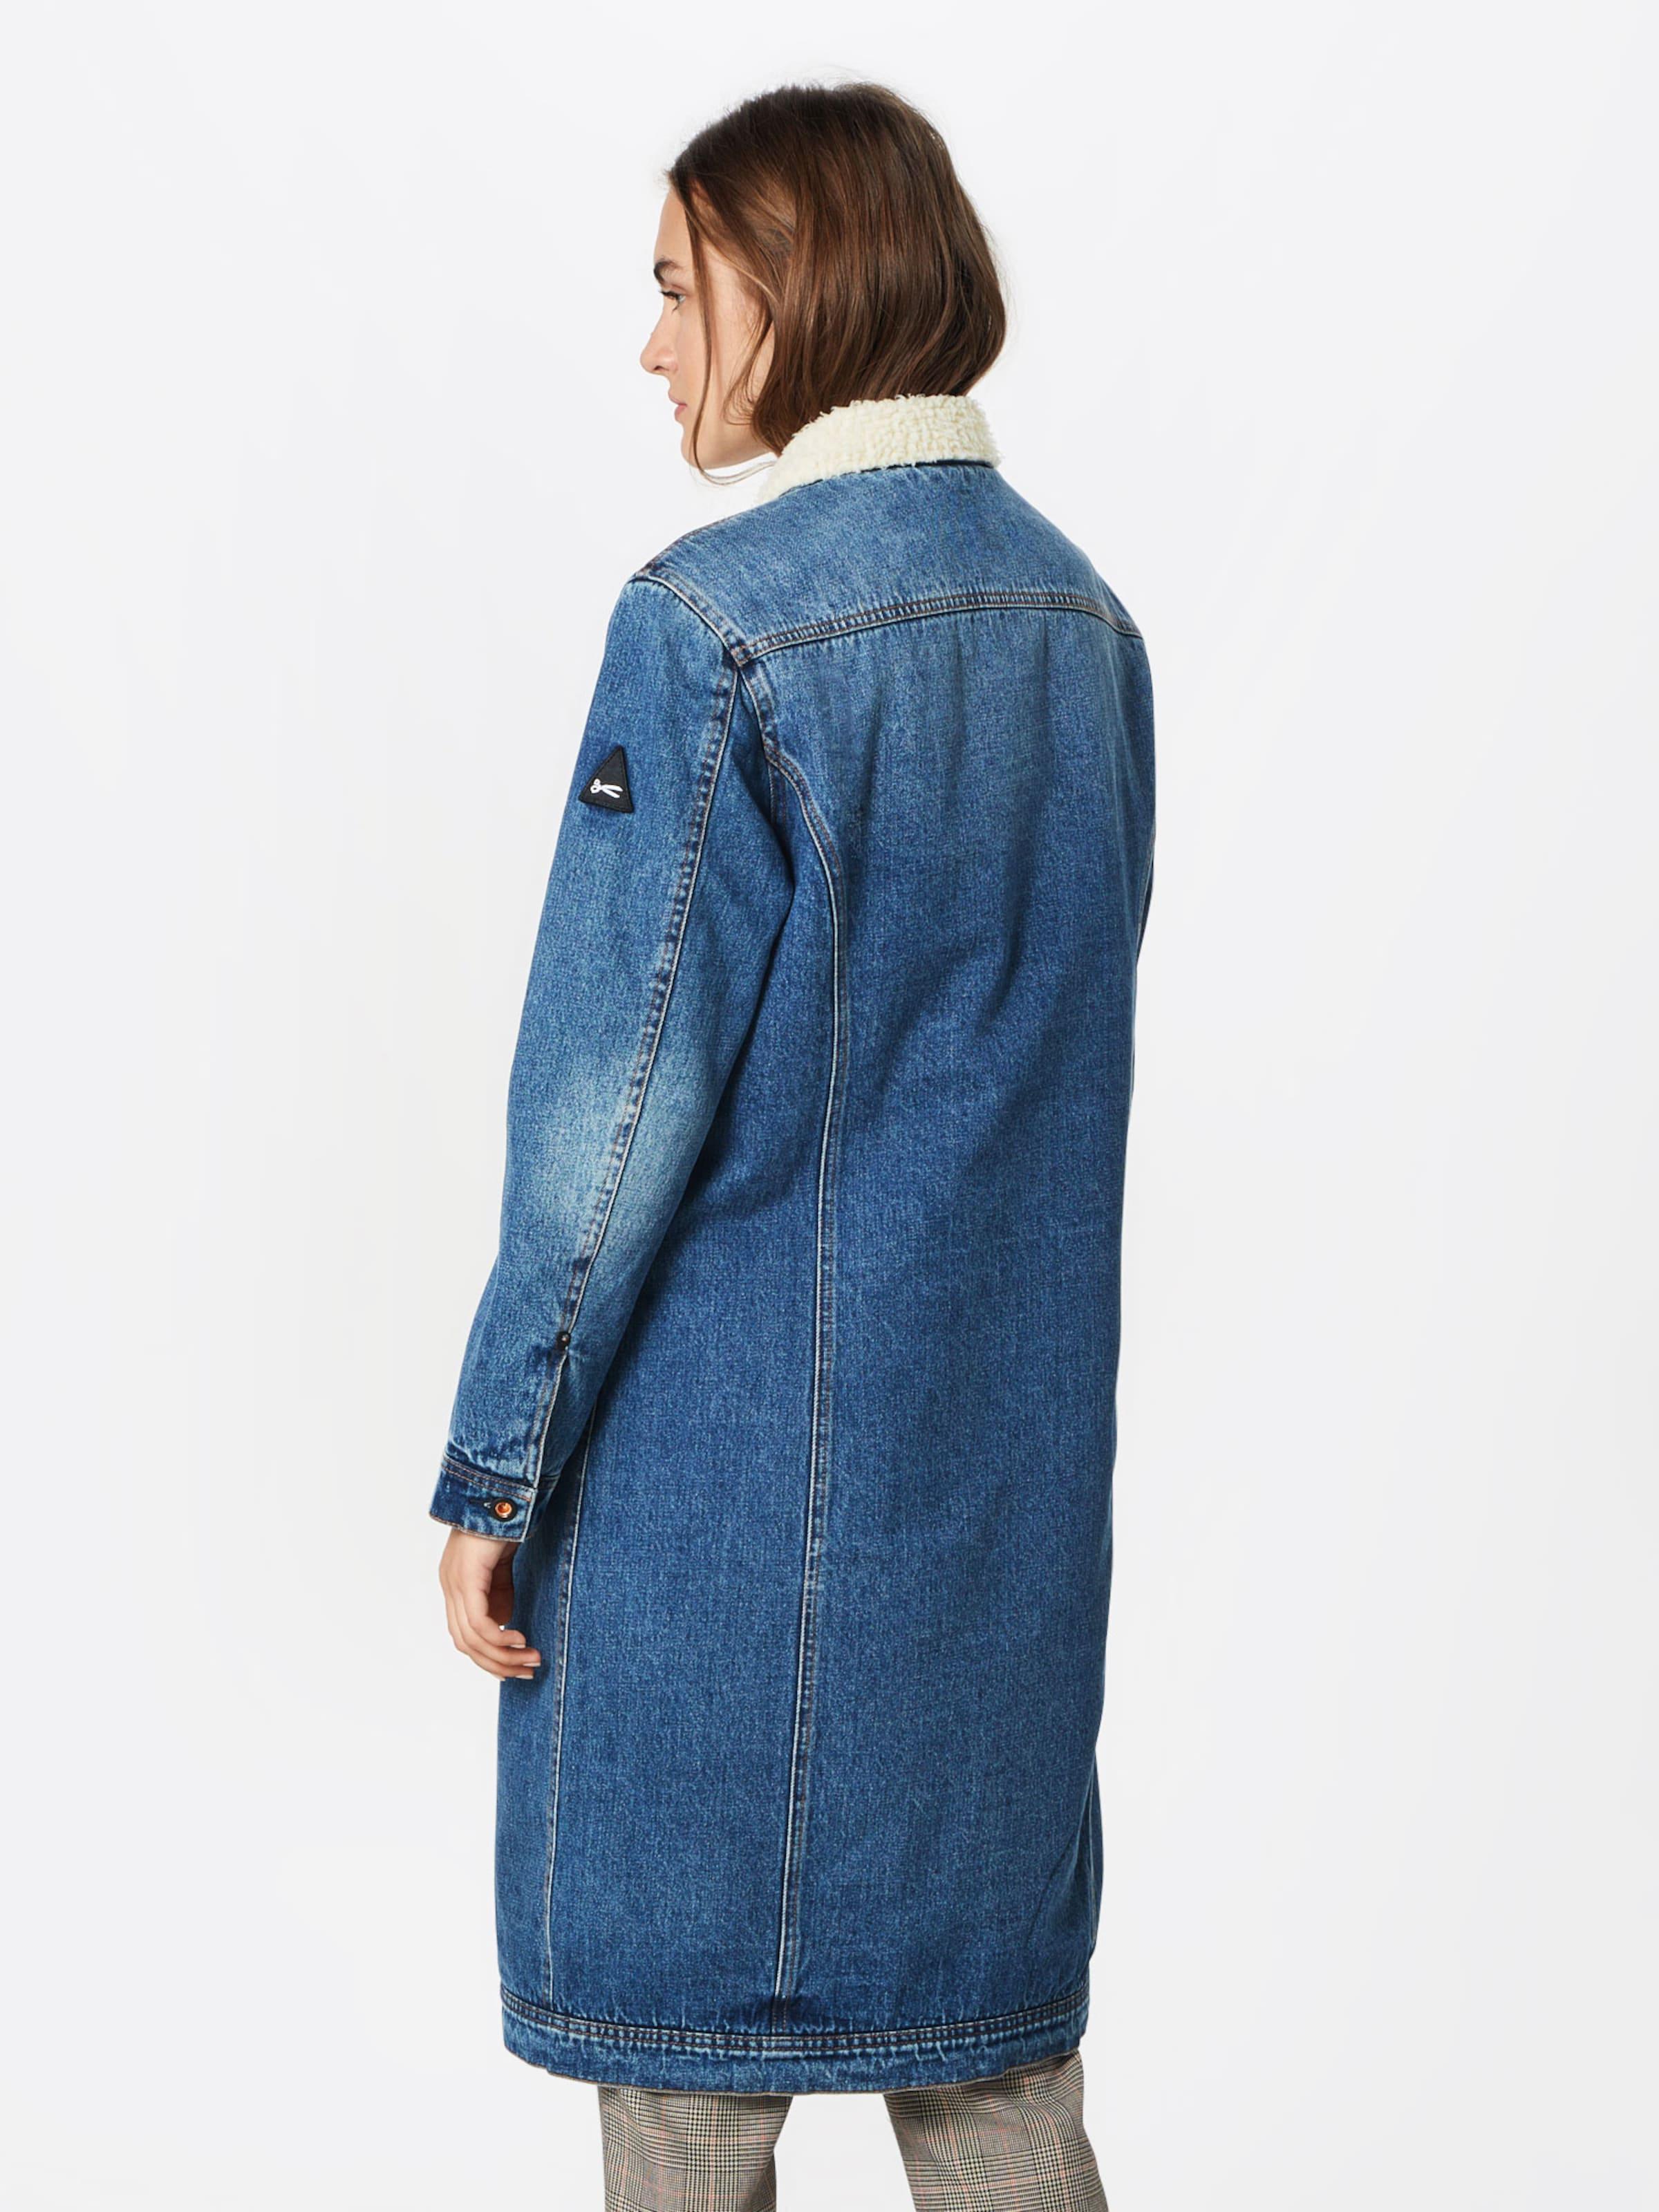 En Manteau saison Denham Mi Bleu VpLzGSjUMq